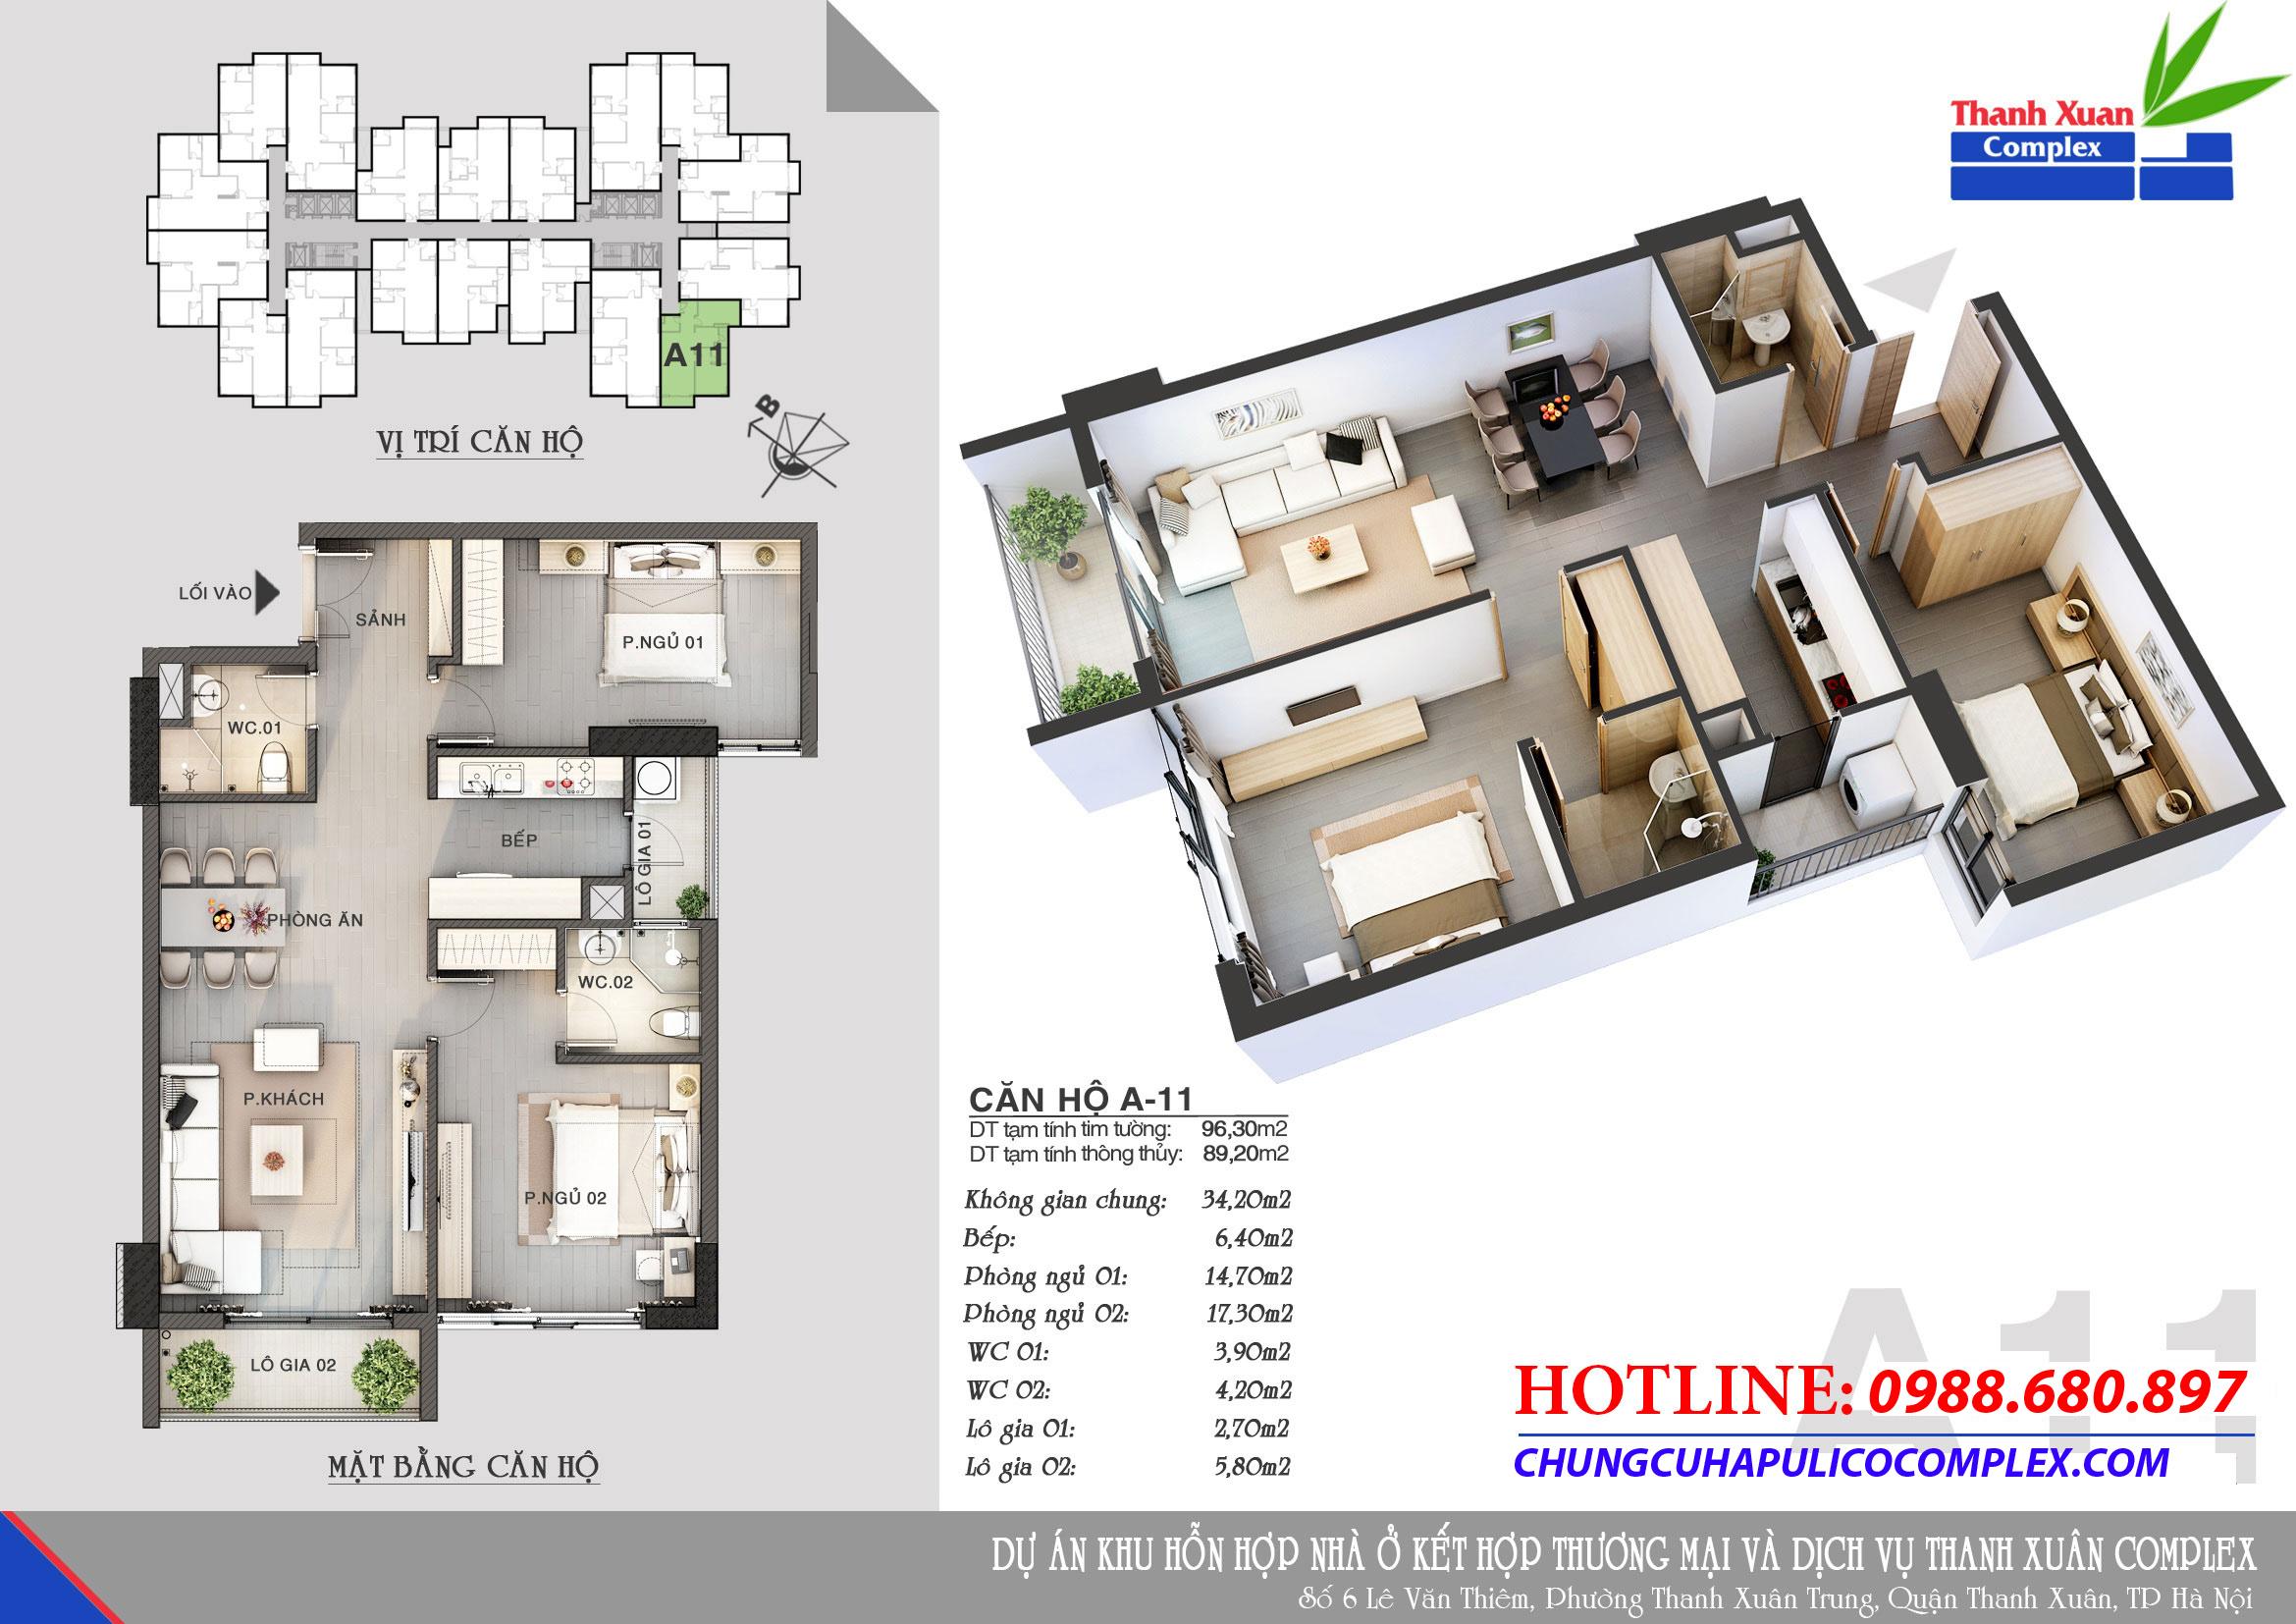 HSB_Thanhxuan-complex_CH-A11_suachotT42016-copy